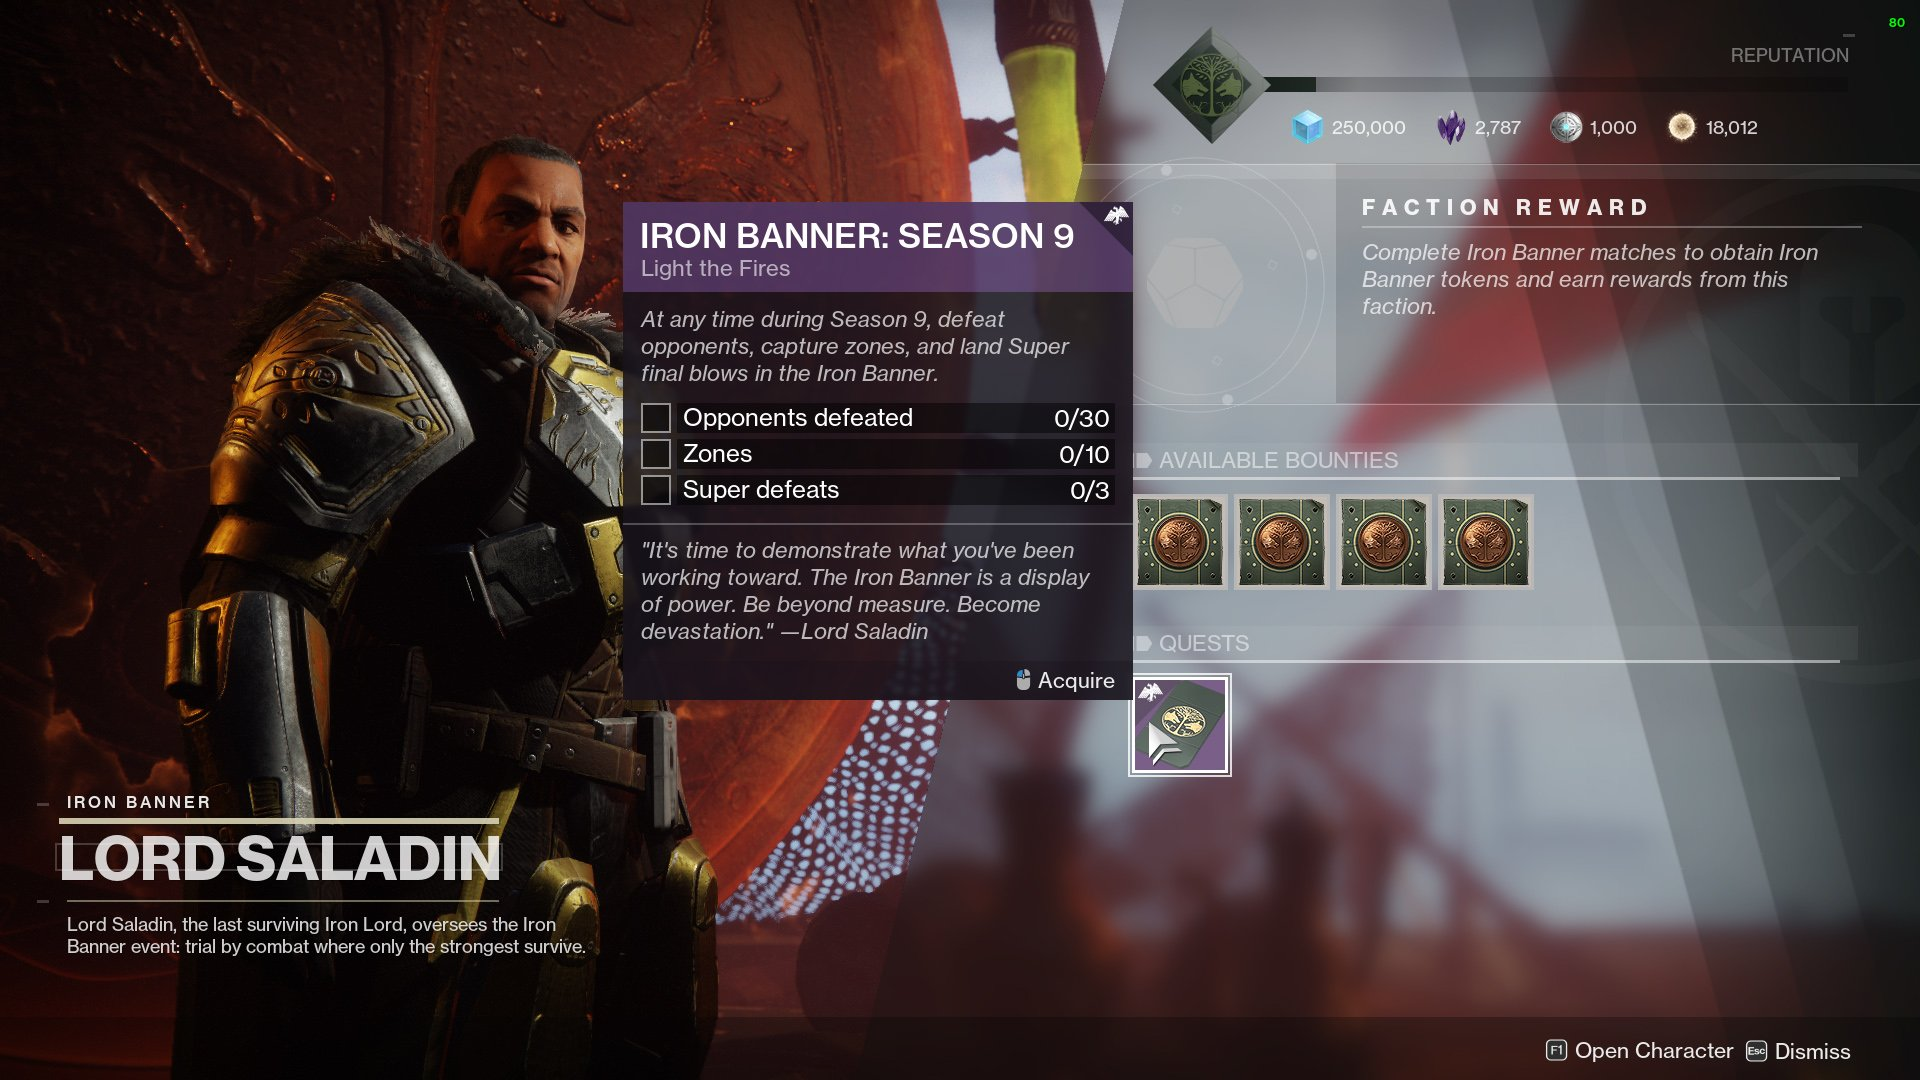 iron banner season 9 quest destiny 2